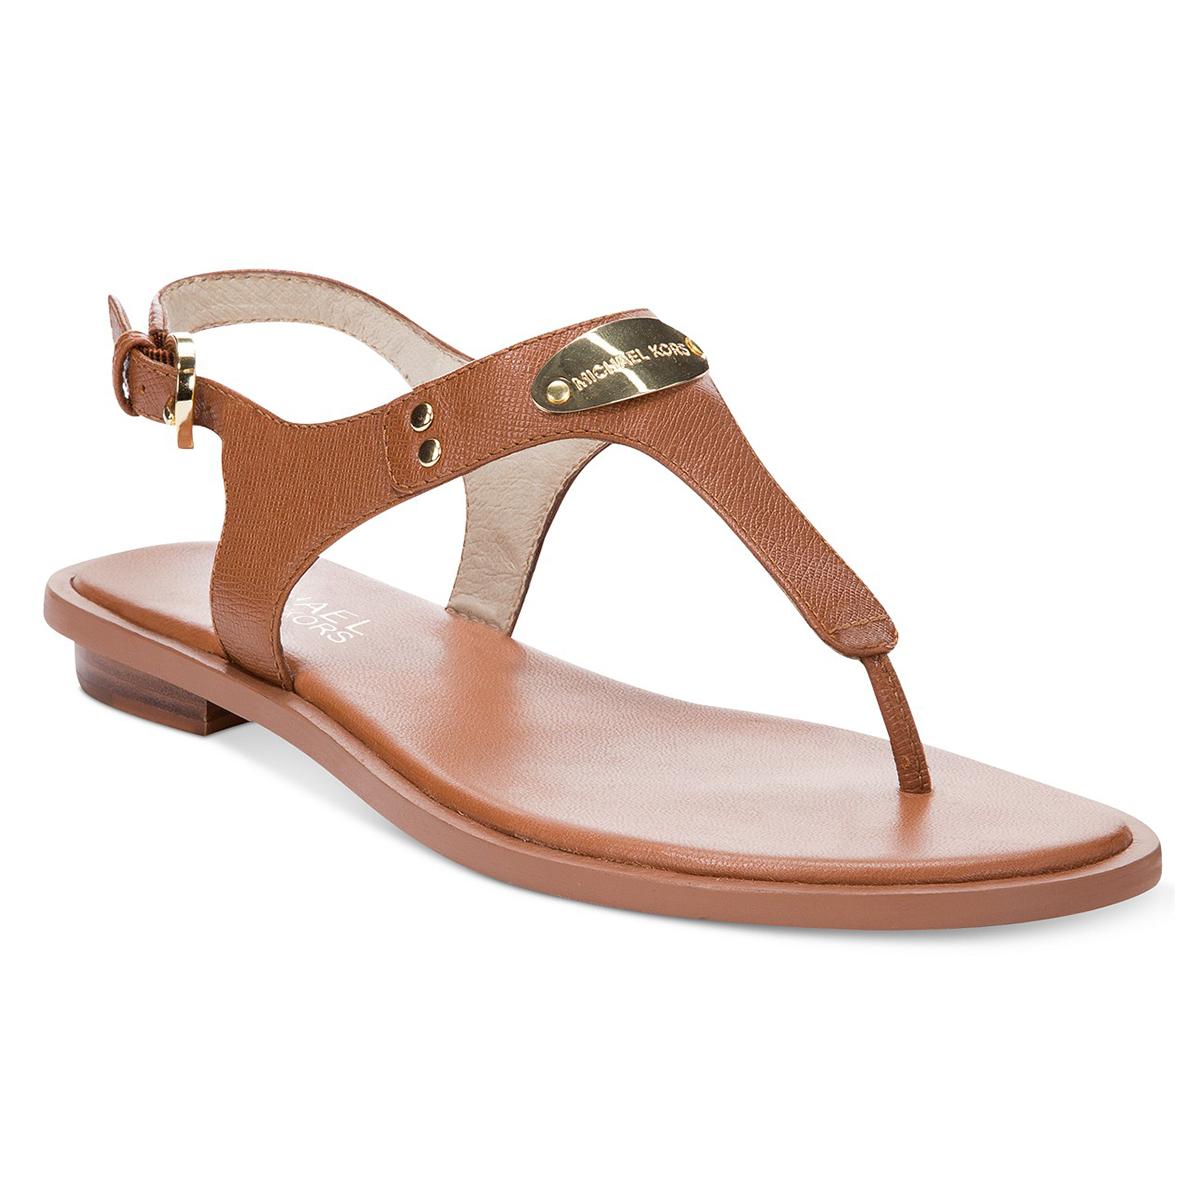 MK Sandals Luggage